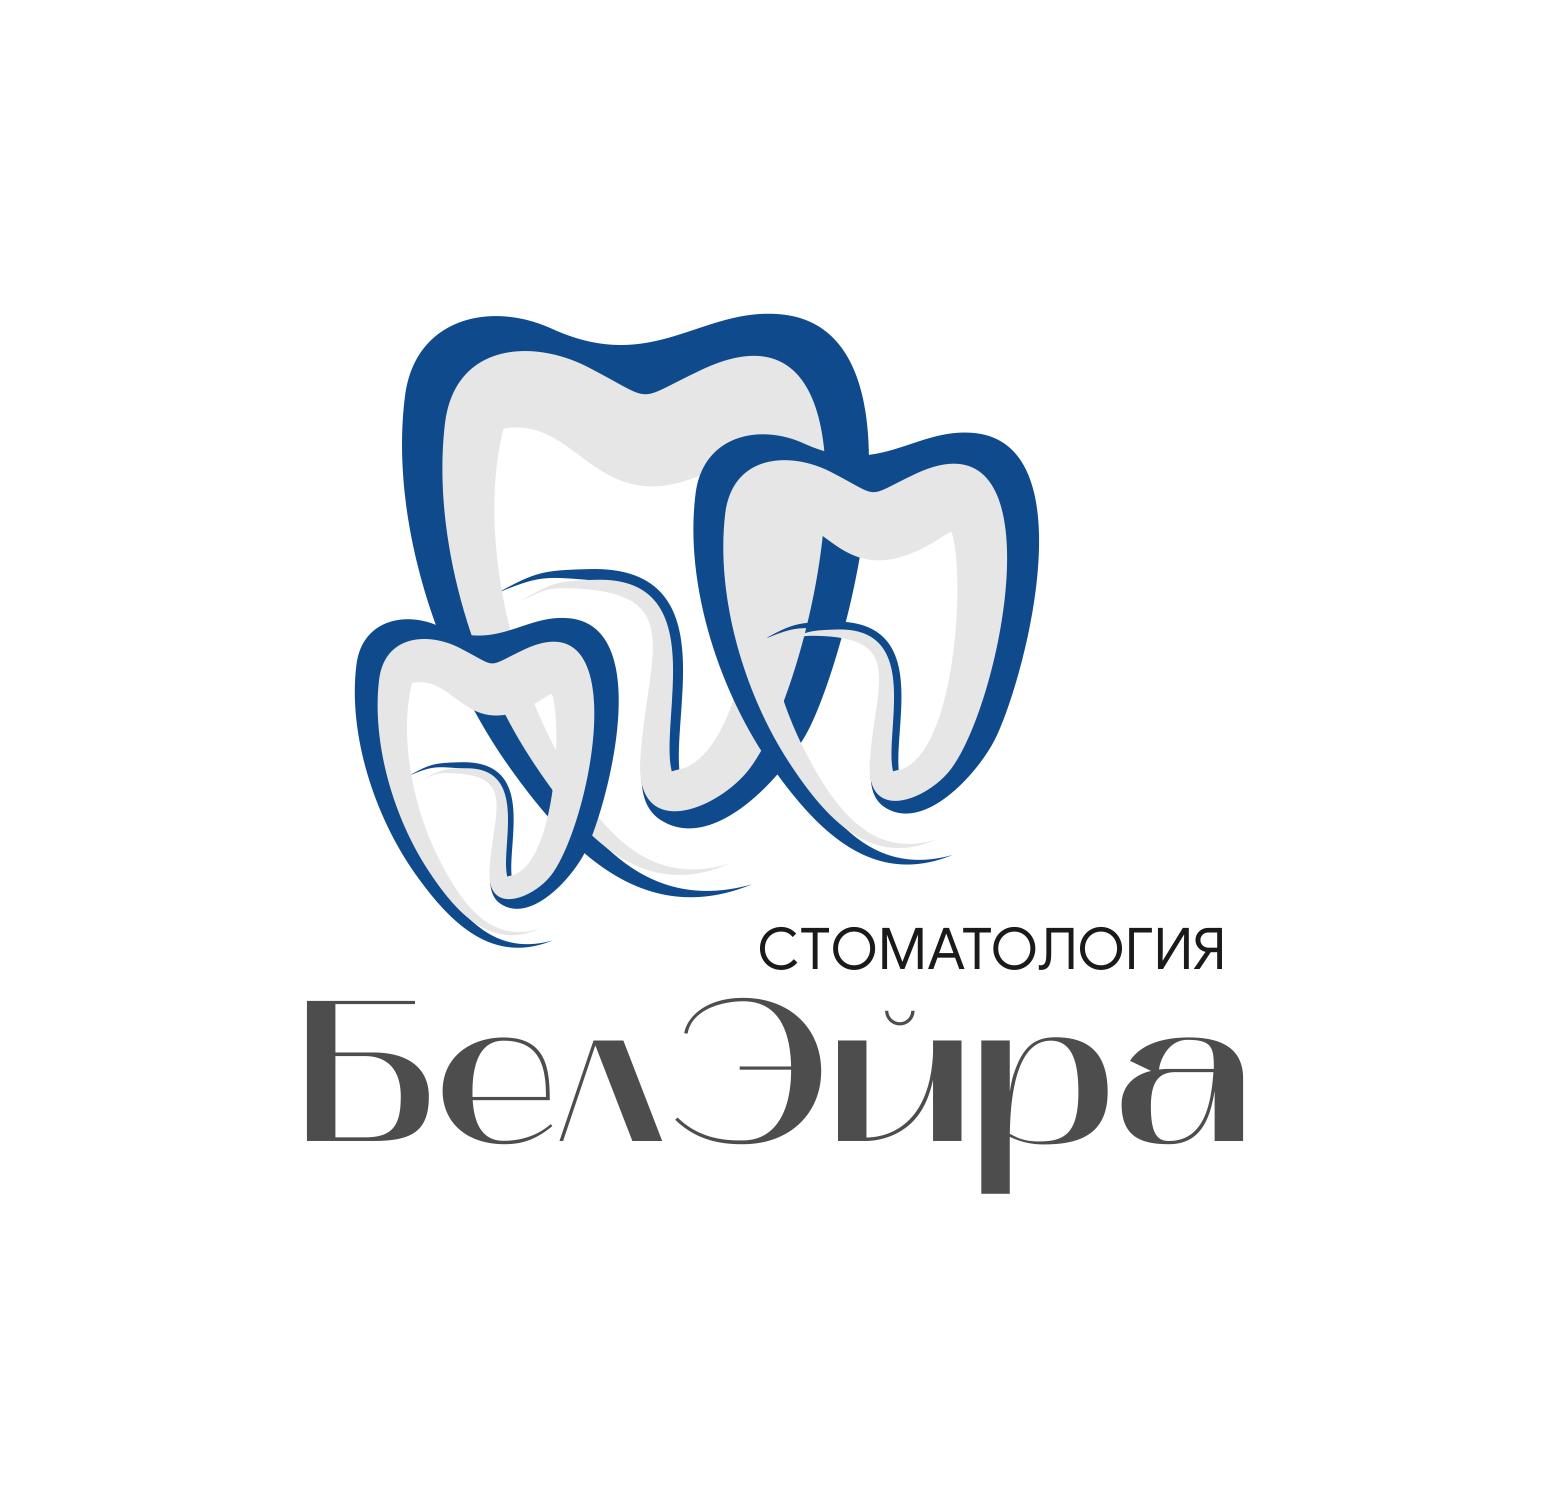 Логотип БелЭйра на белом.png